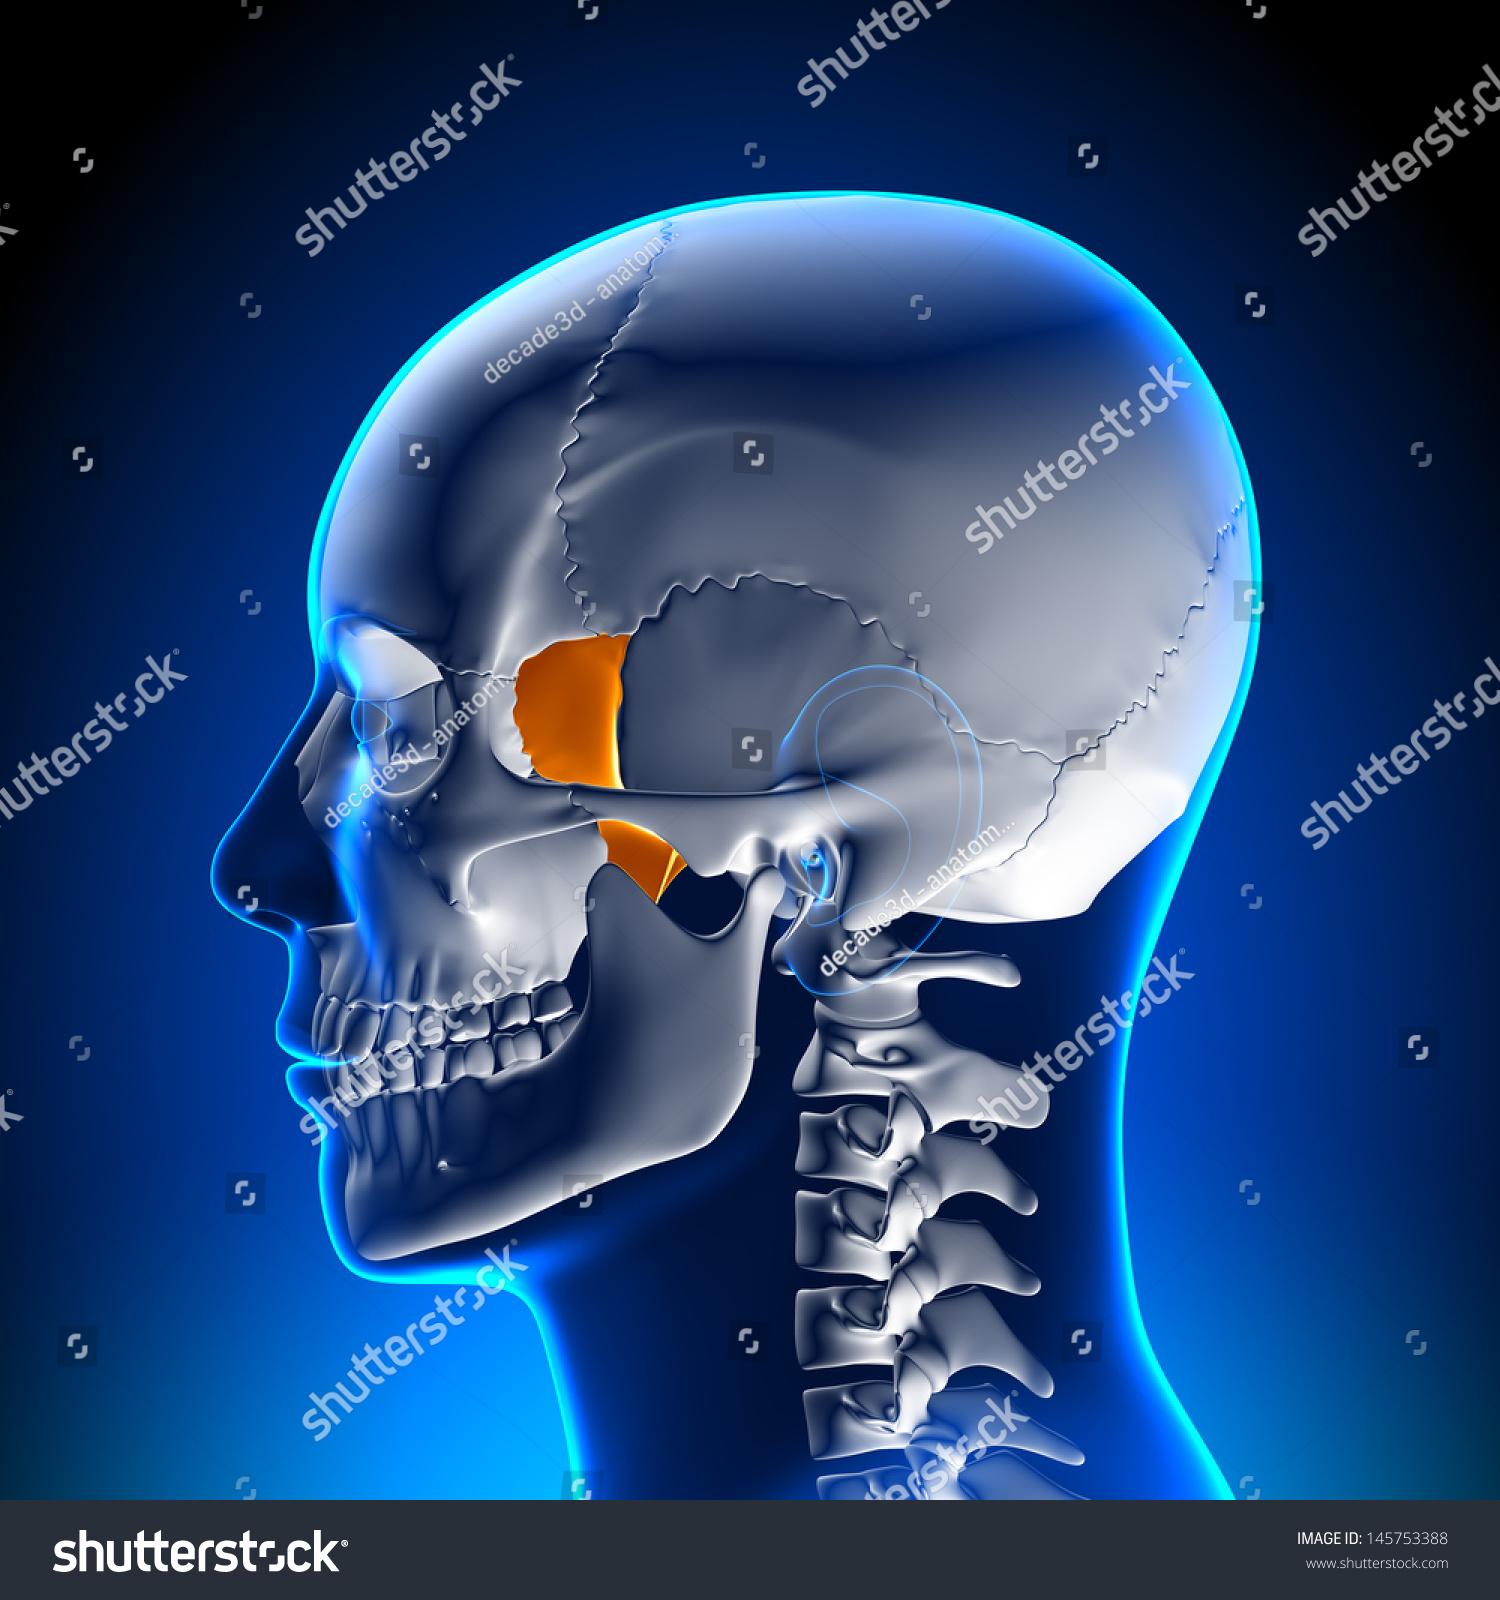 Lacrimal Bone Skull Anatomy Stock Illustration 145753388 - Shutterstock